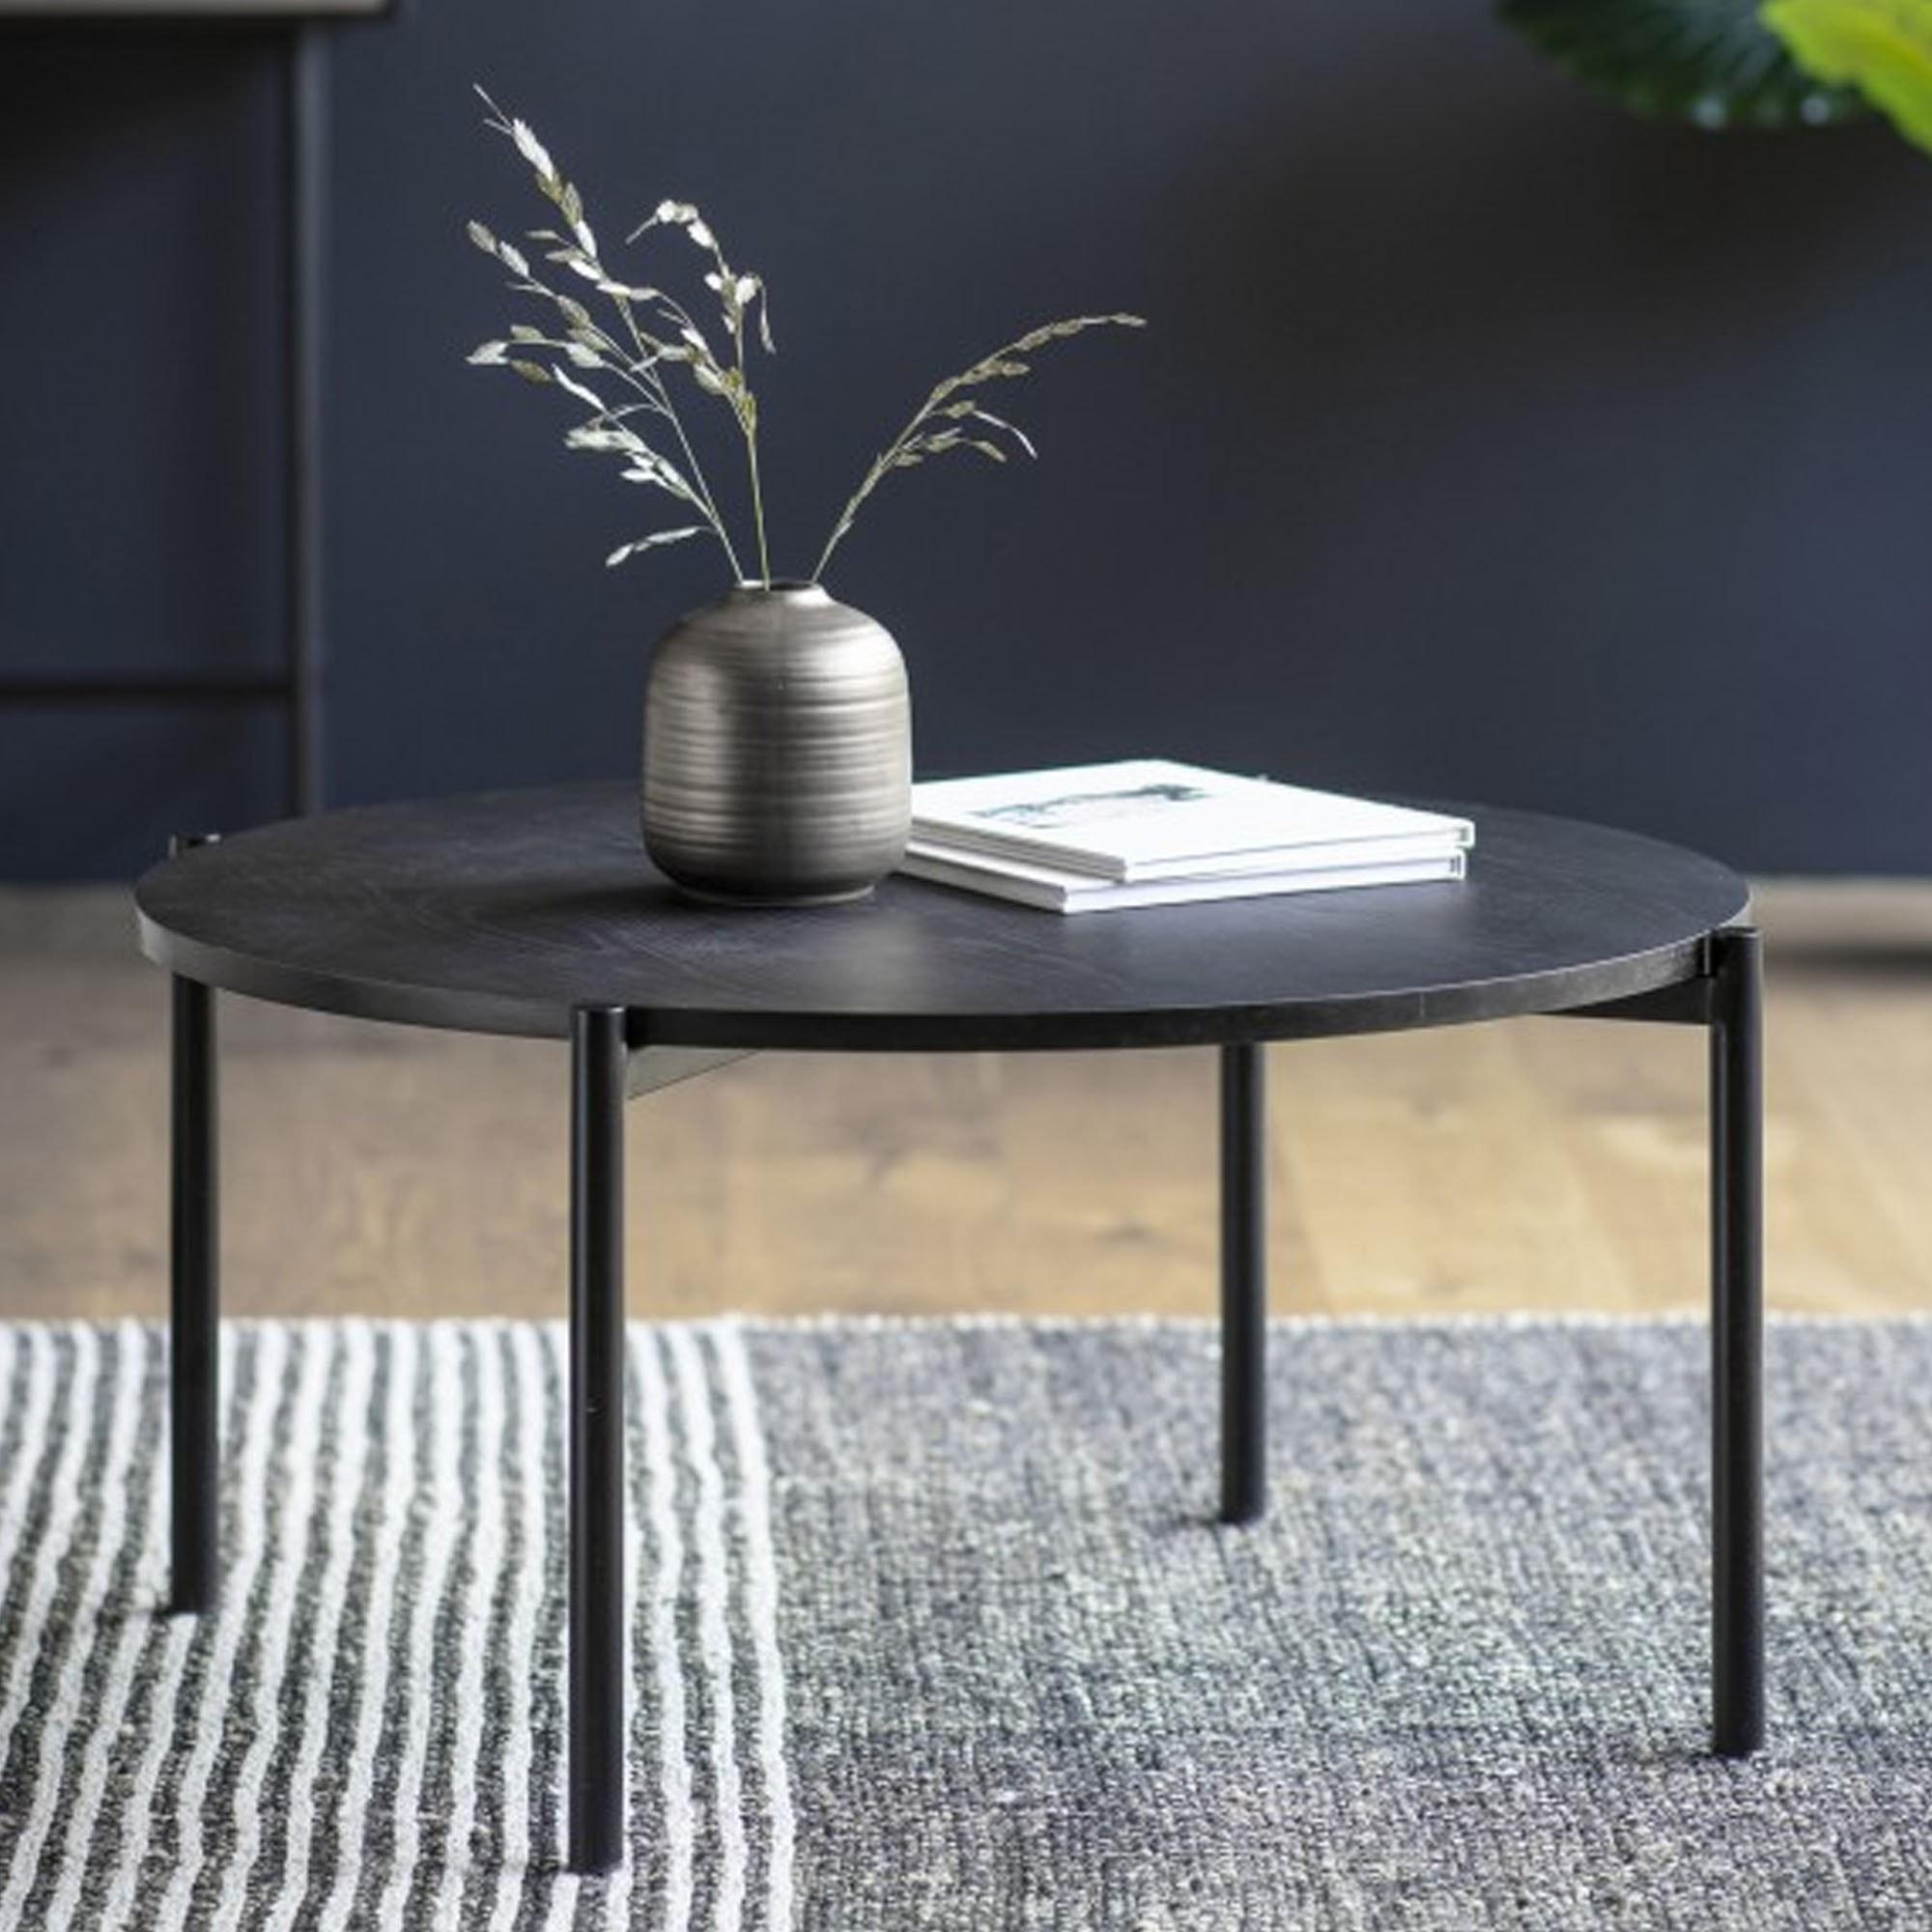 Carbury Coffee Table Black Modern Coffee Table Industrial Coffee Table